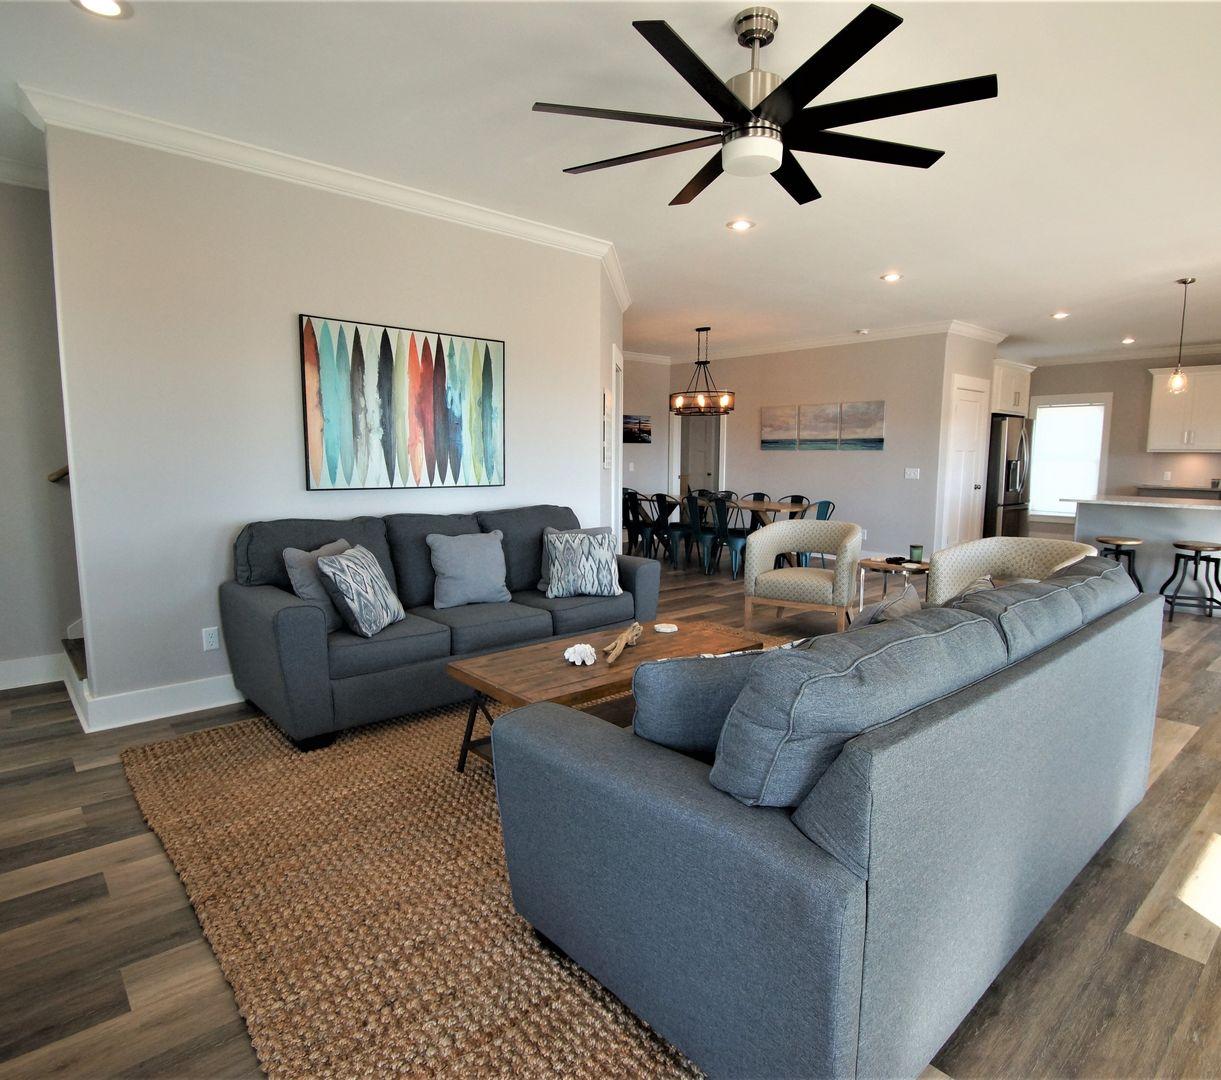 The living area has a sleeper sofa to sleep 2, TV, and coffee table.